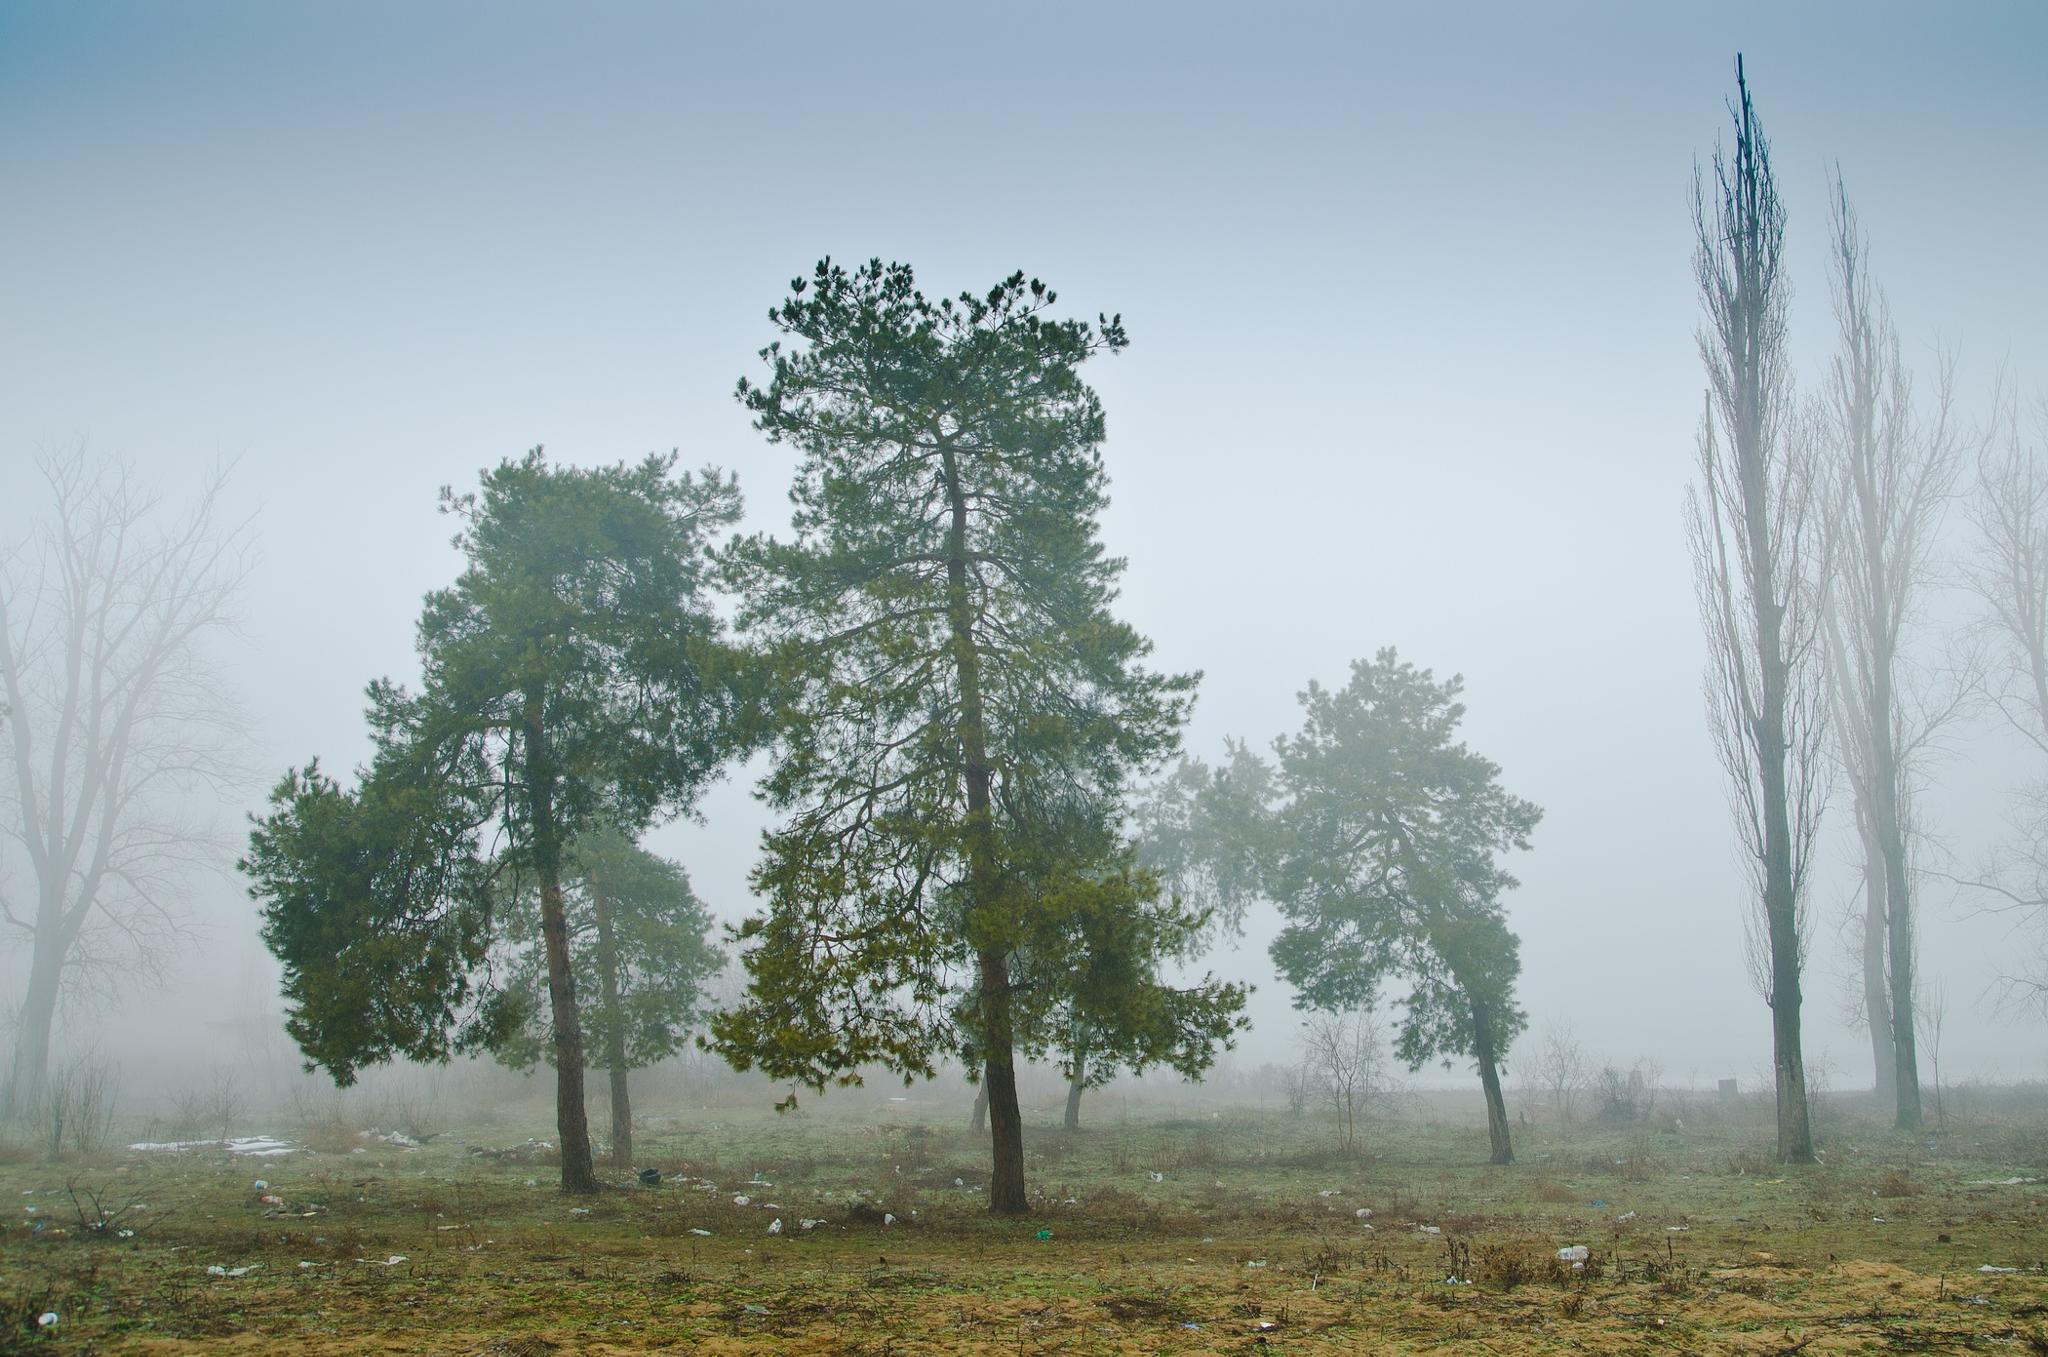 trees in the mist by Dan Cristian